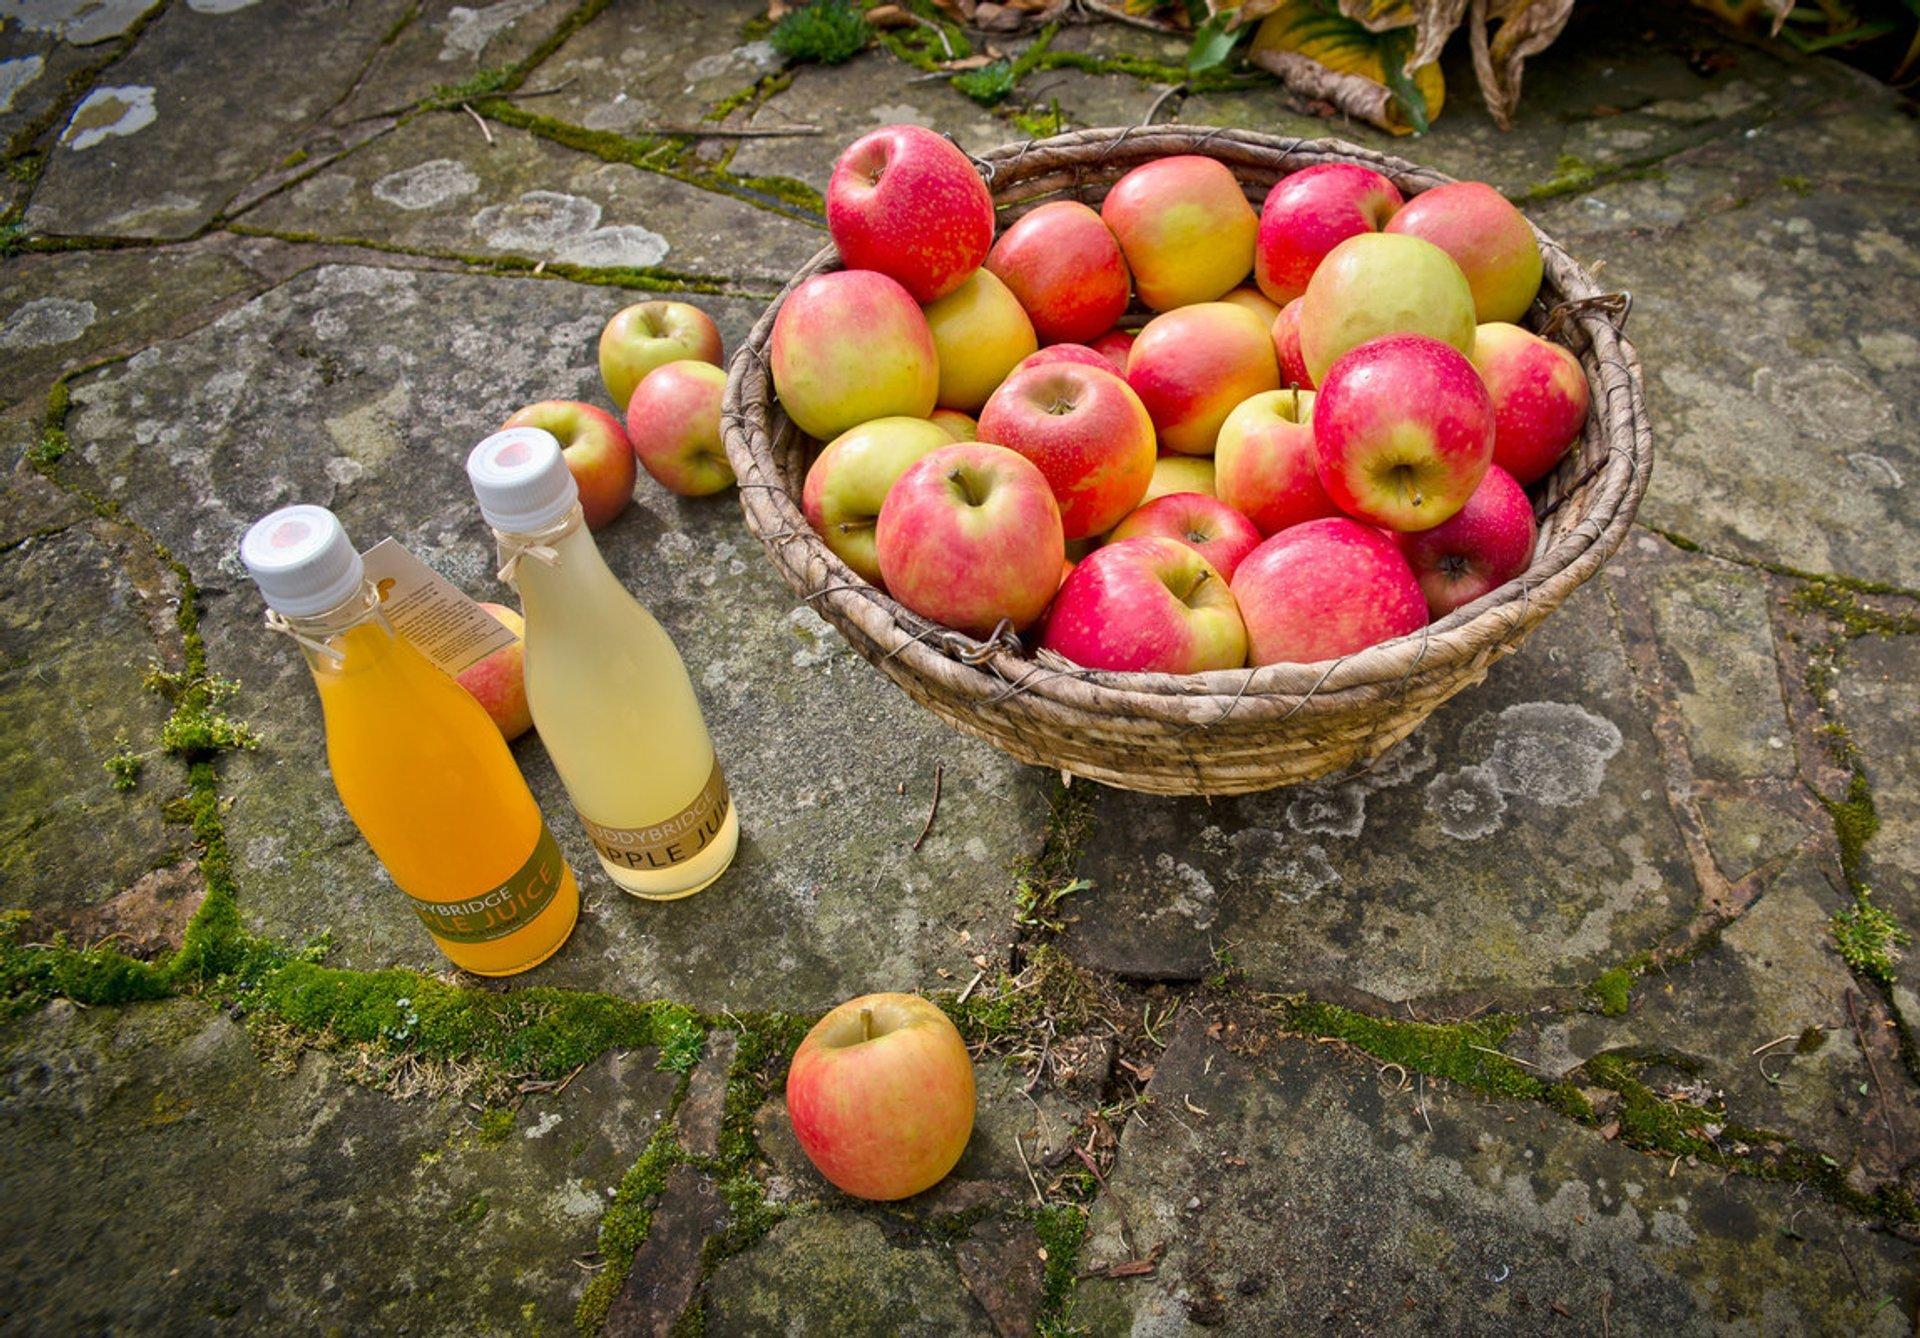 Natural freshly squeezed apple juice. Cuddybridge Applejuice, handpreseed in the Scottish Borders 2019